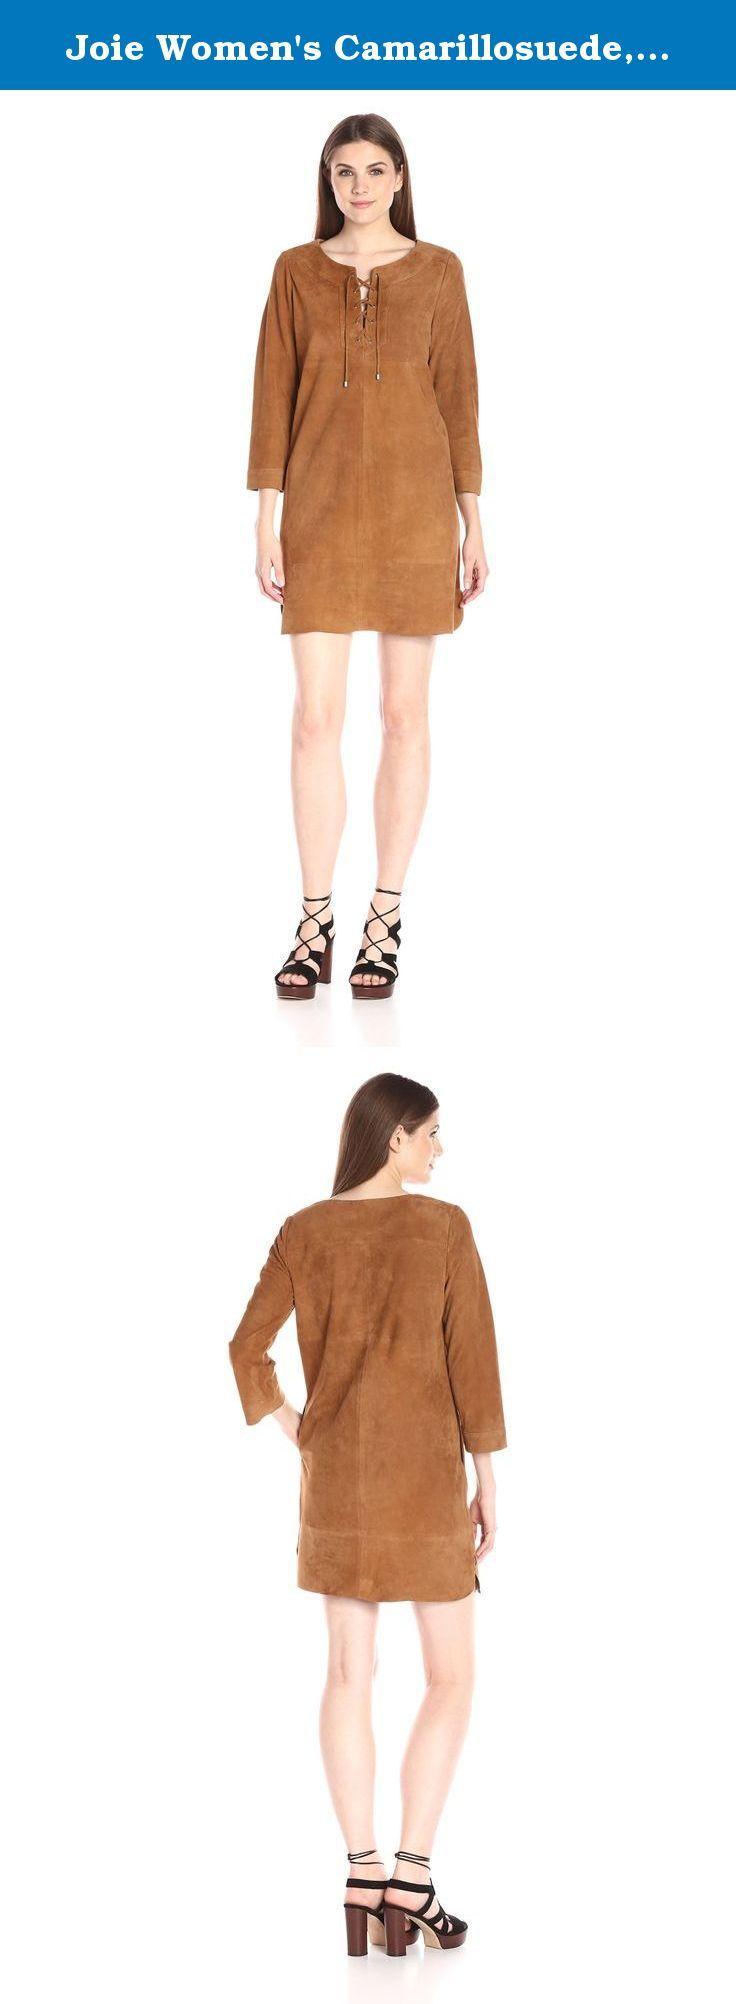 Joie Women's Camarillosuede, Honey, X-Small. Joie women's Camarillo tie up suede casual dress. Great fall basic.